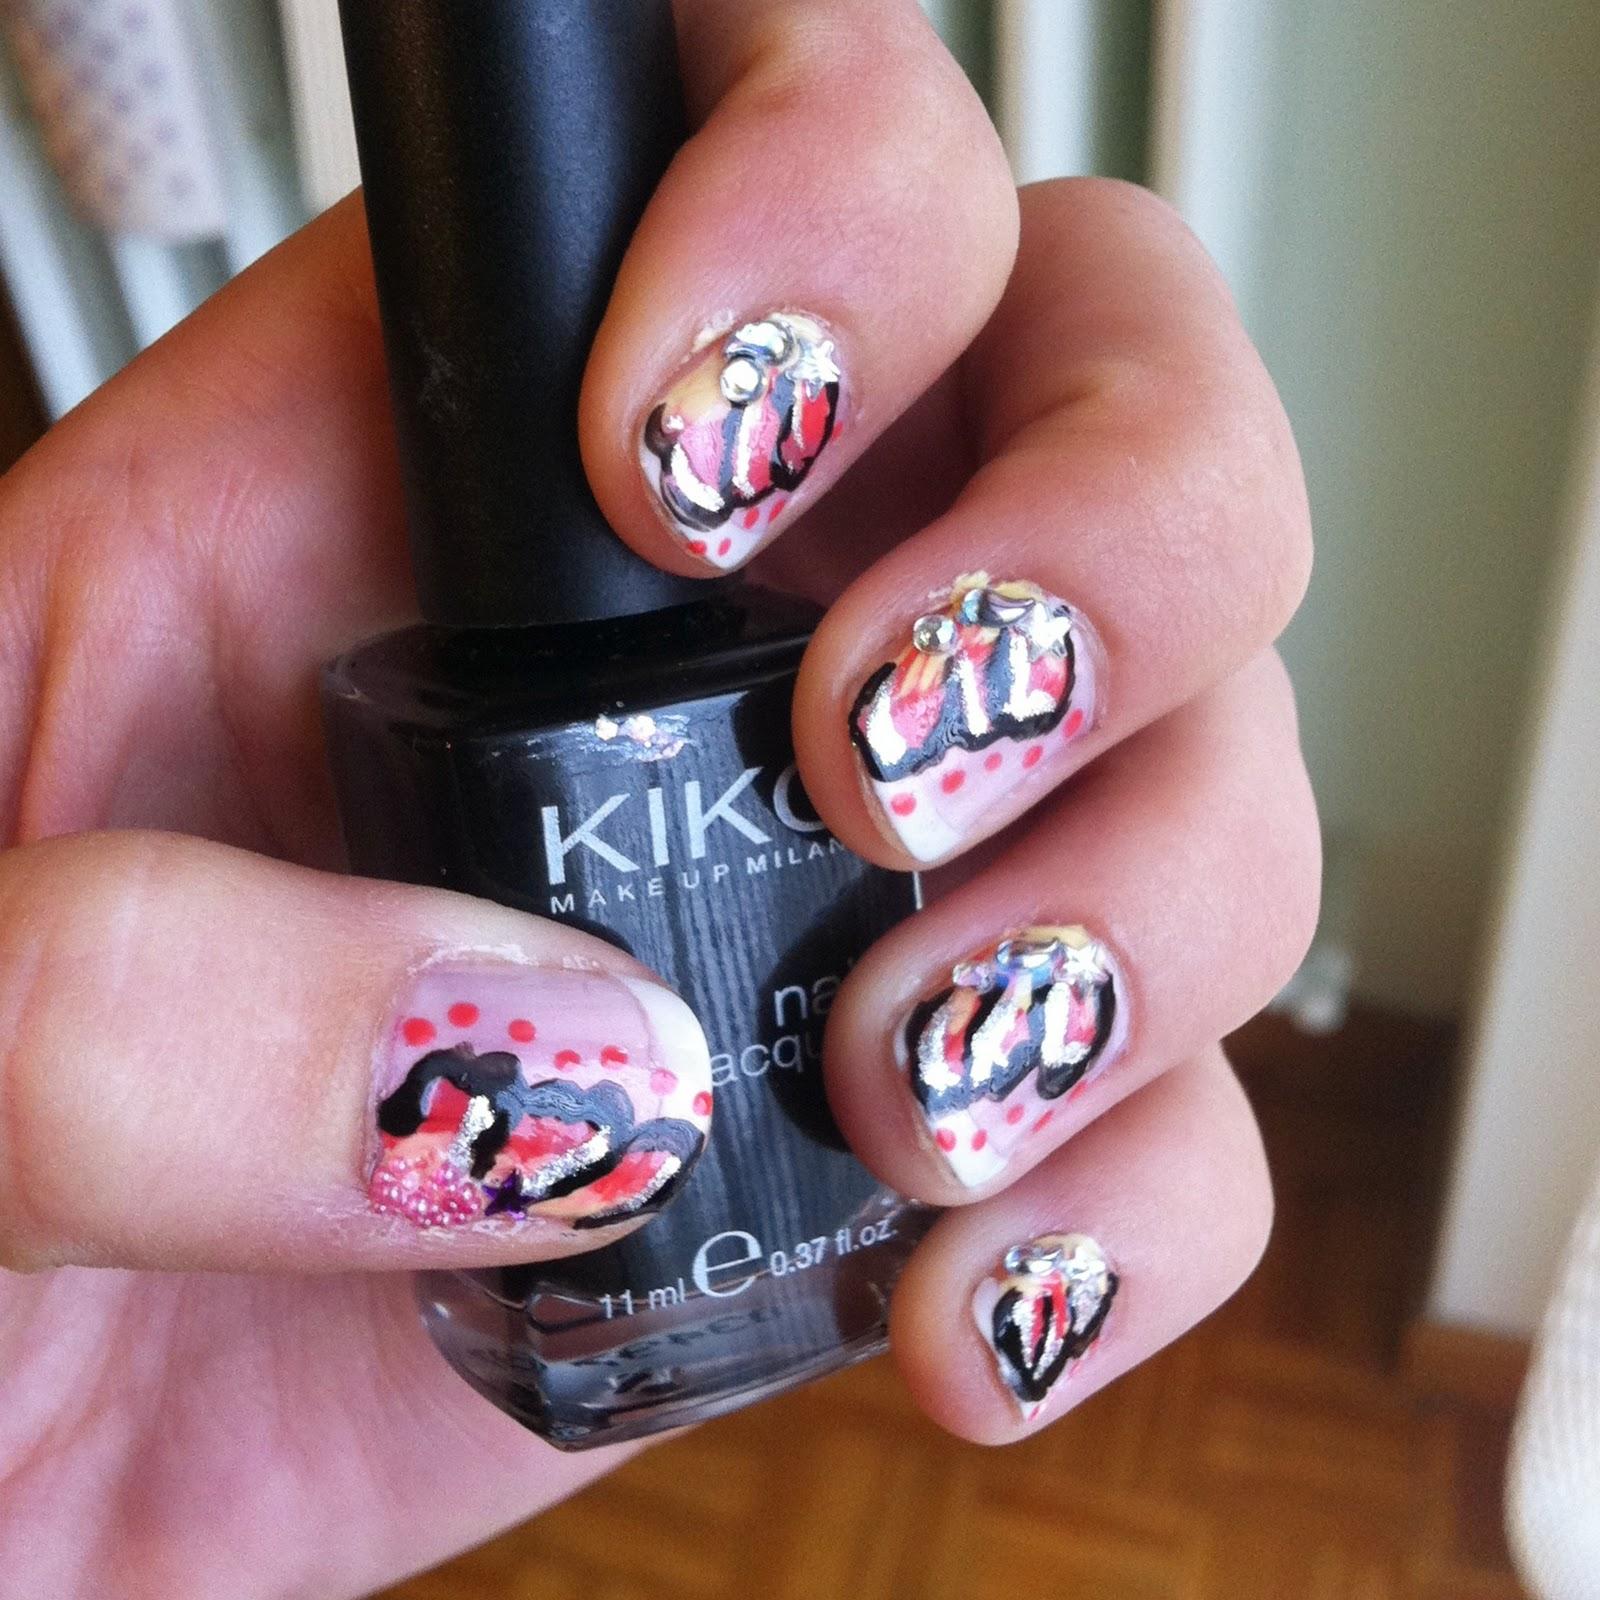 Deeply diva weekly nail art 9 - Diva nails prodotti ...